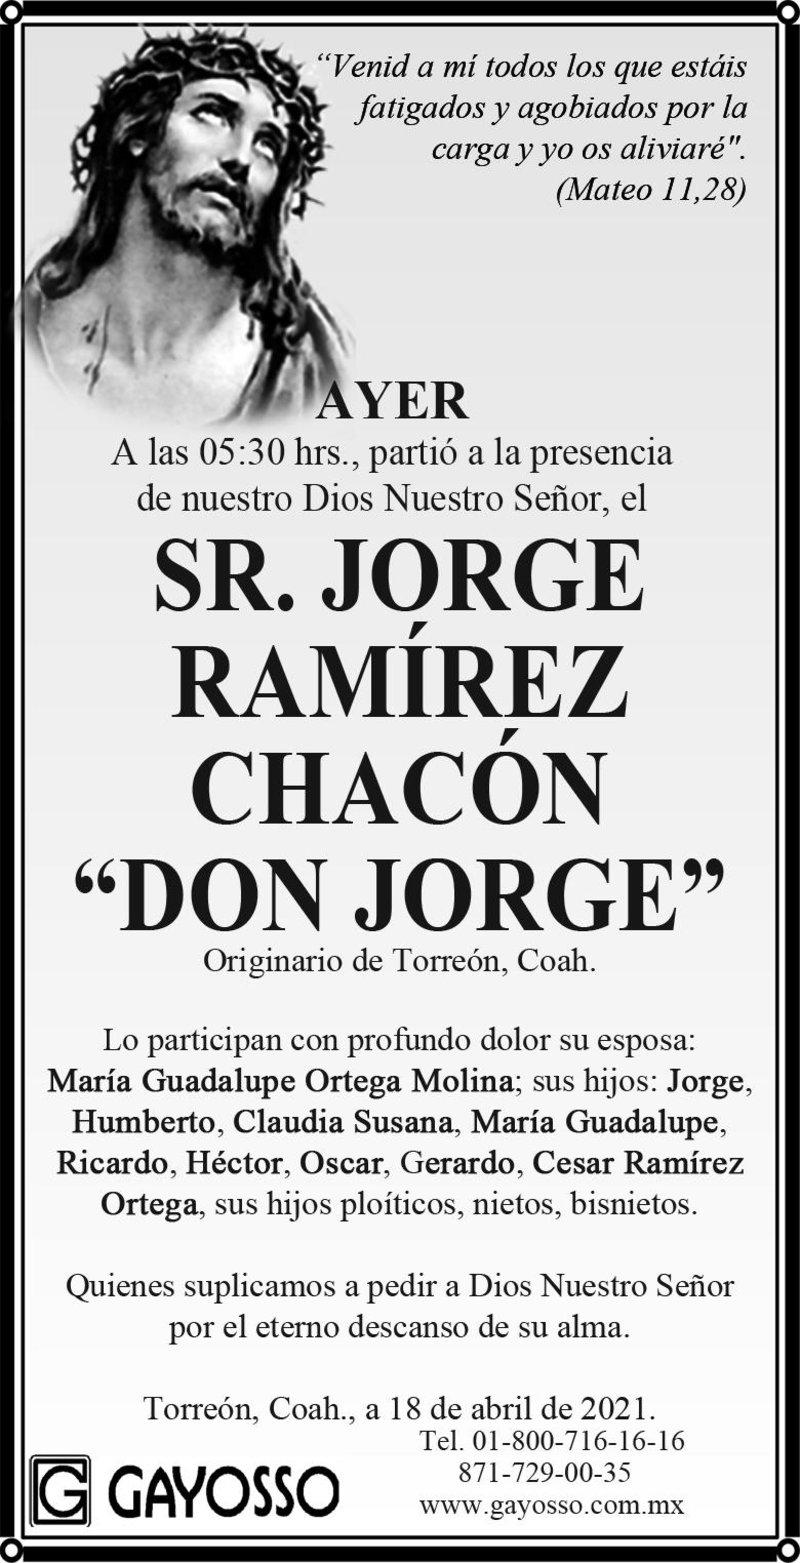 ESQUELA: JORGE RAMÍREZ CHACÓN. Ayer a las 05:30 hrs., falleció el Sr. Jorge Ramírez Chacón. Eterno descanso a su alma.